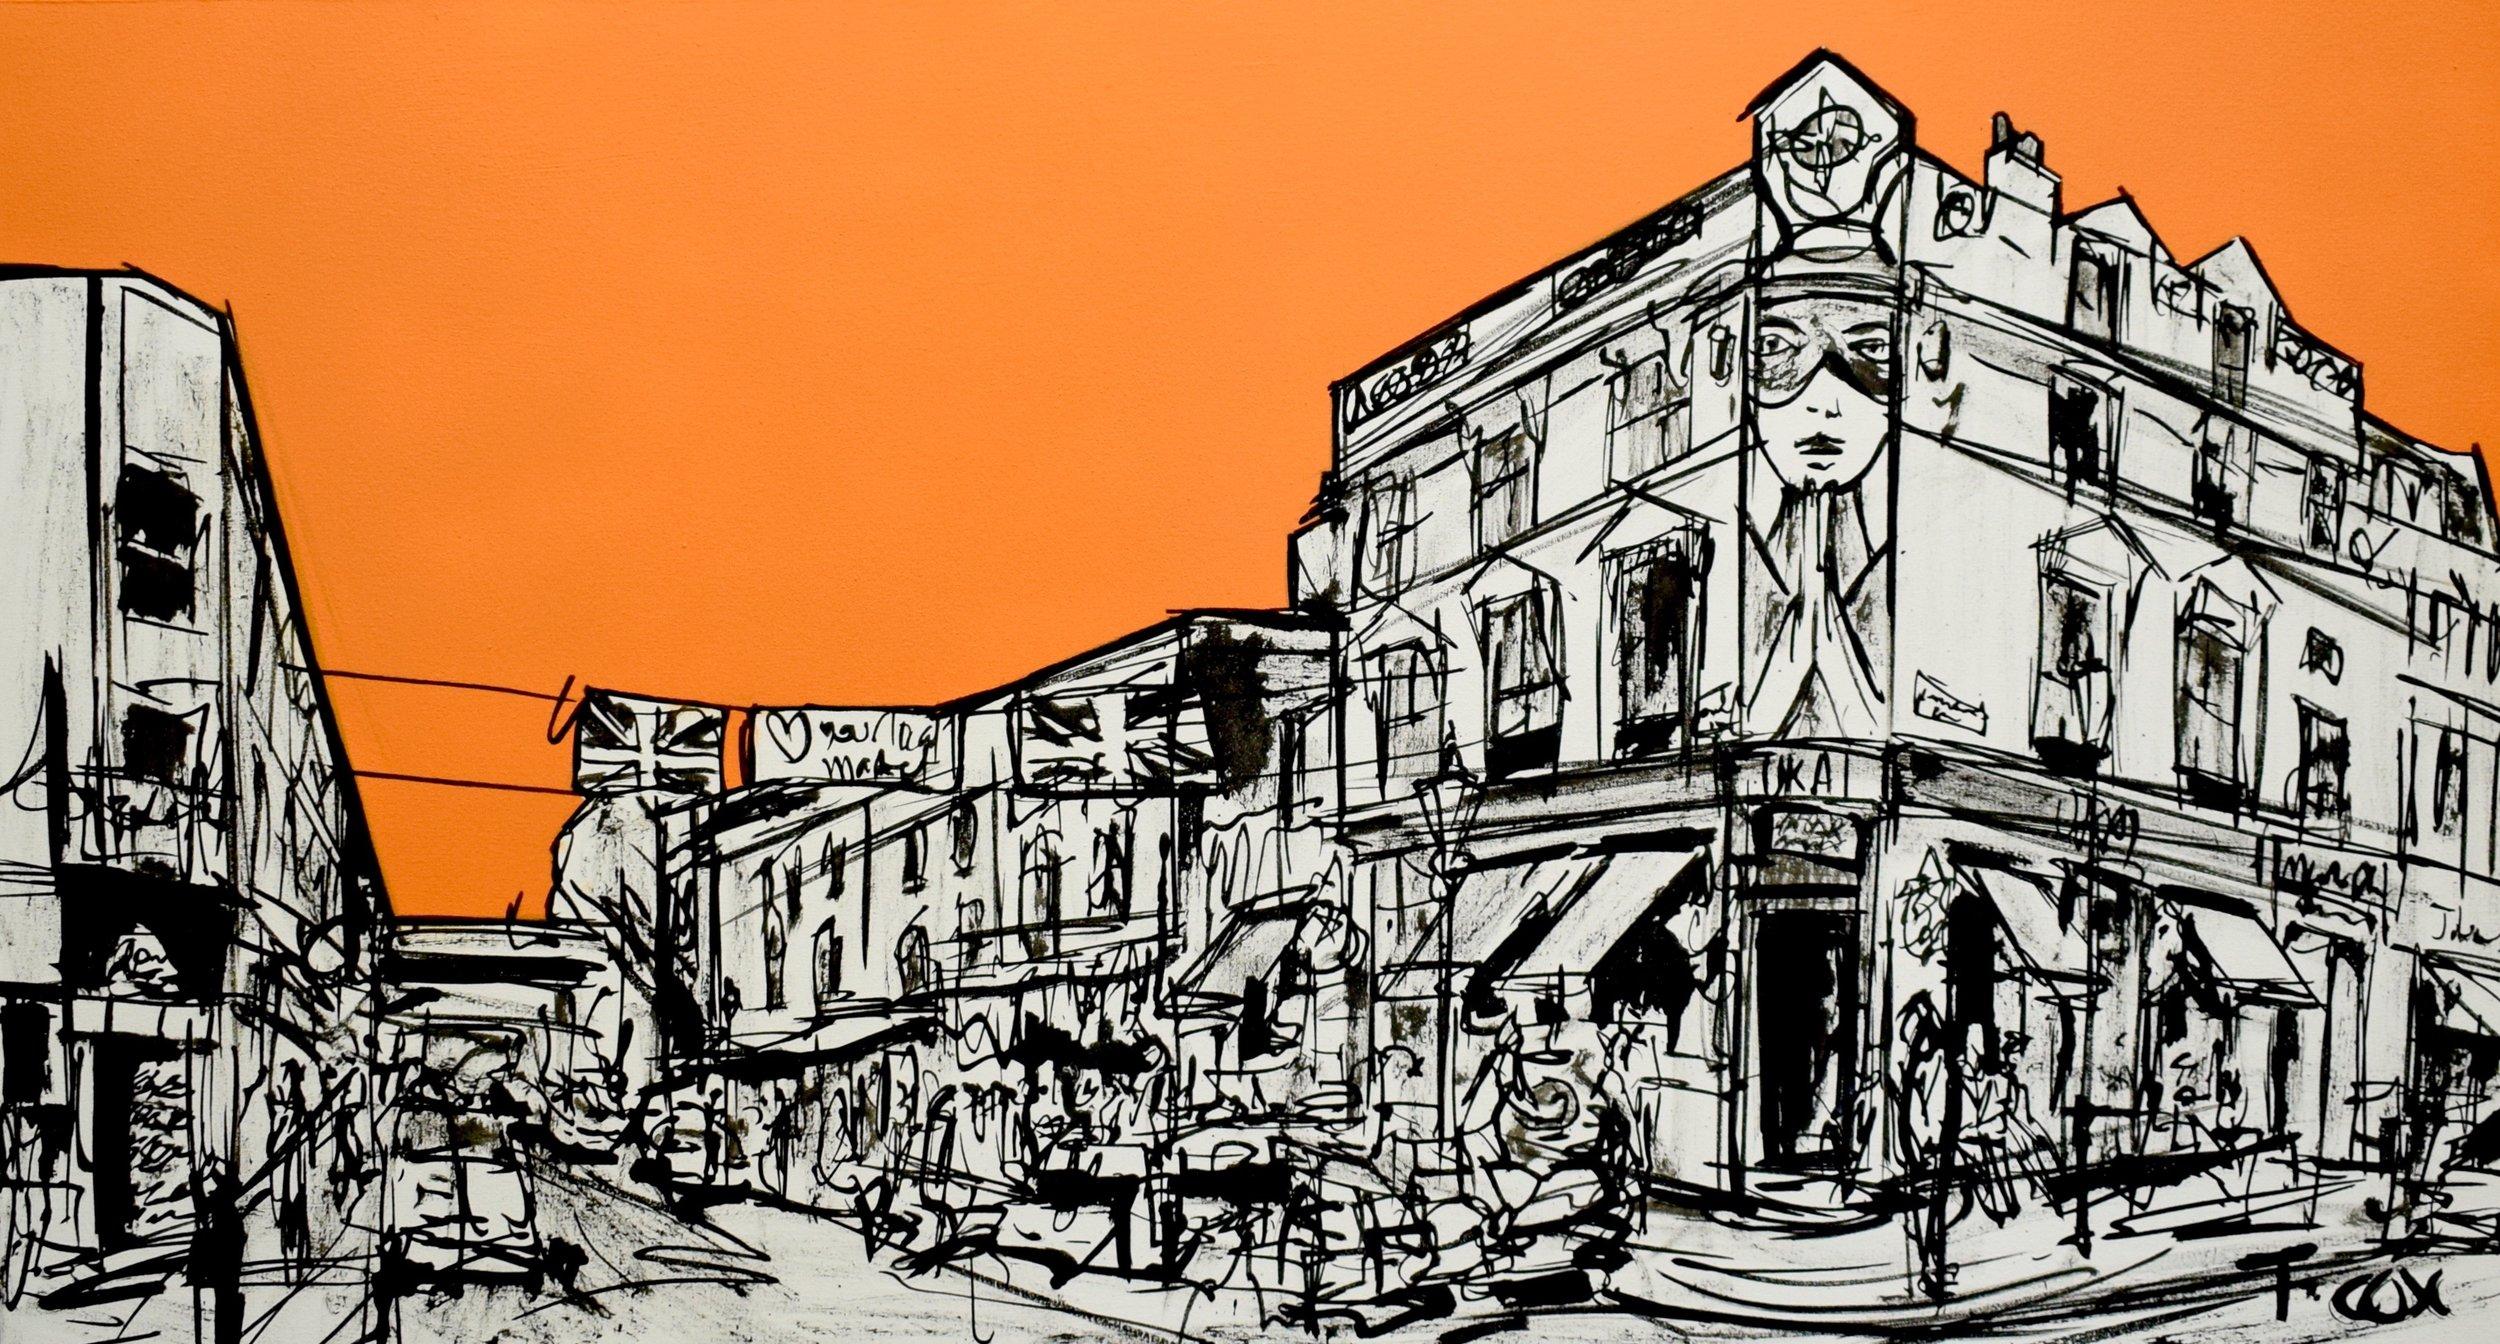 Pubs of Portobello 1/3